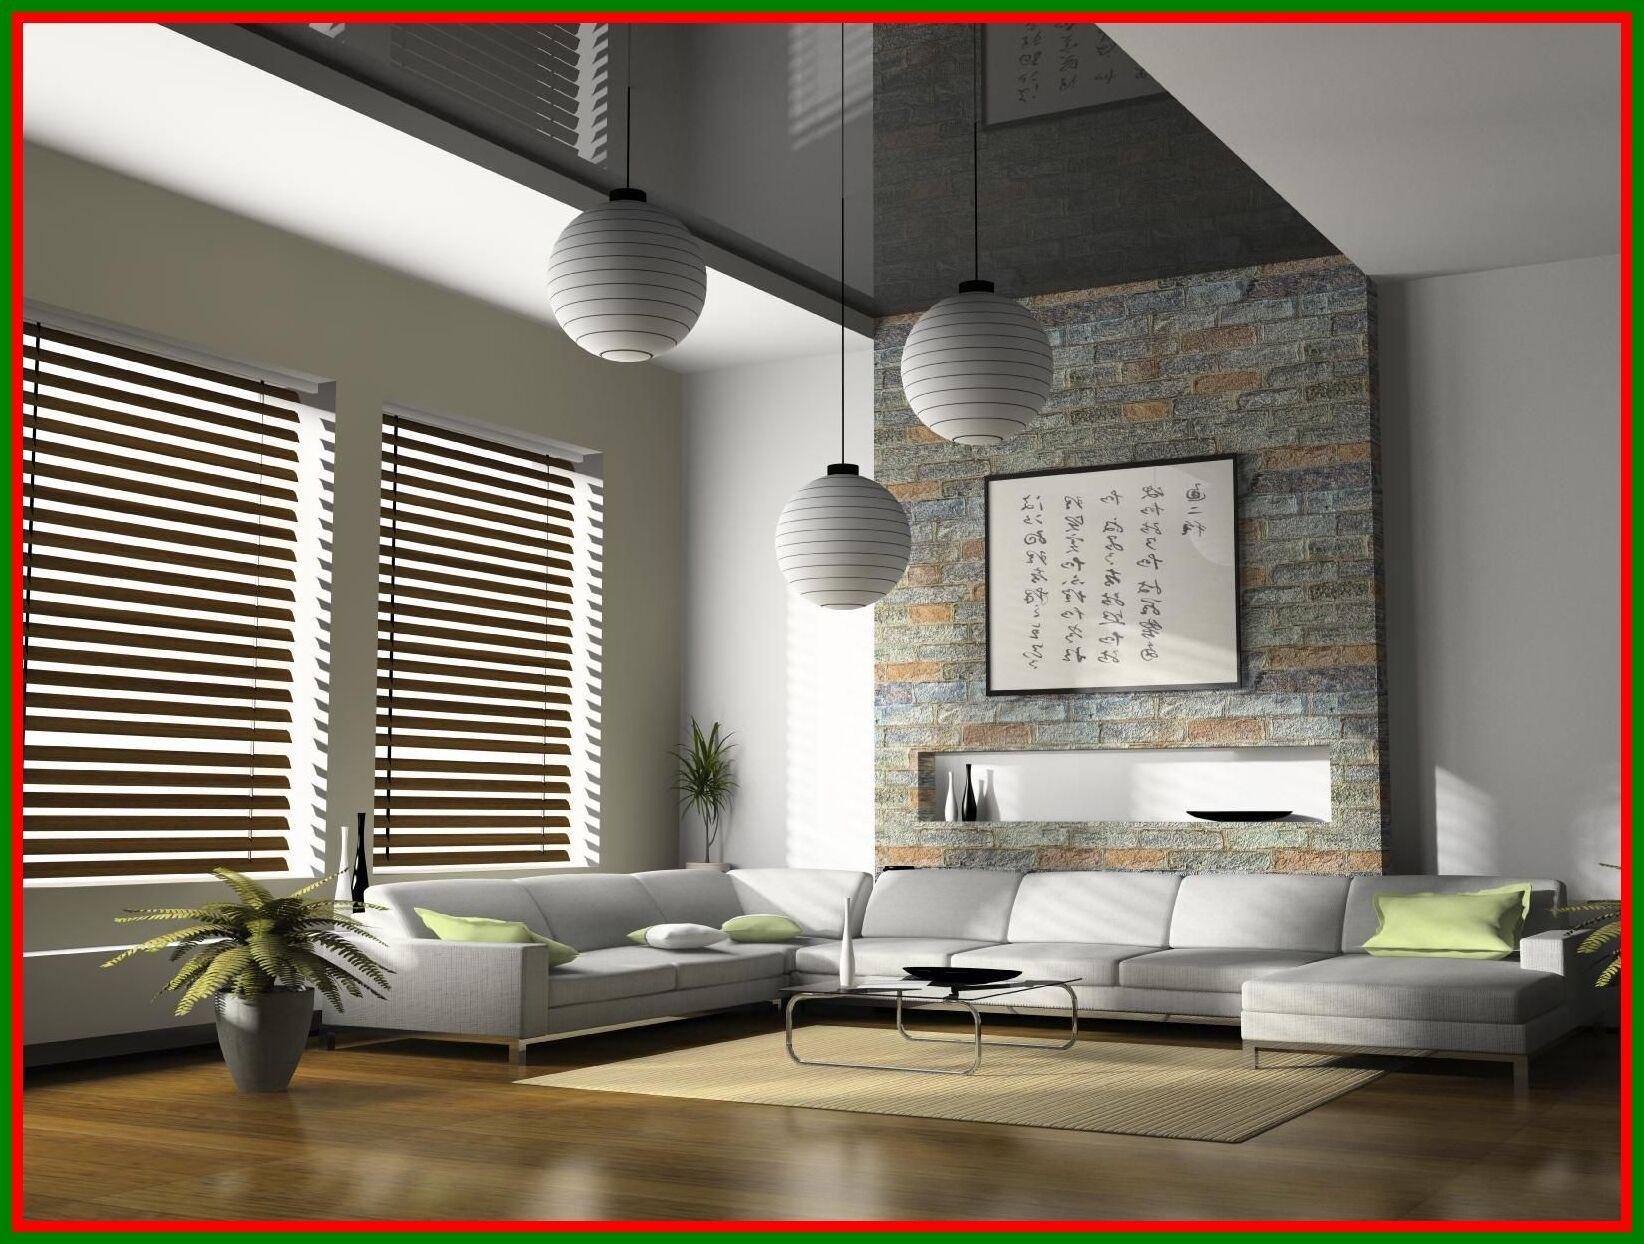 68 Reference Of Roller Blind Living Room In 2020 Living